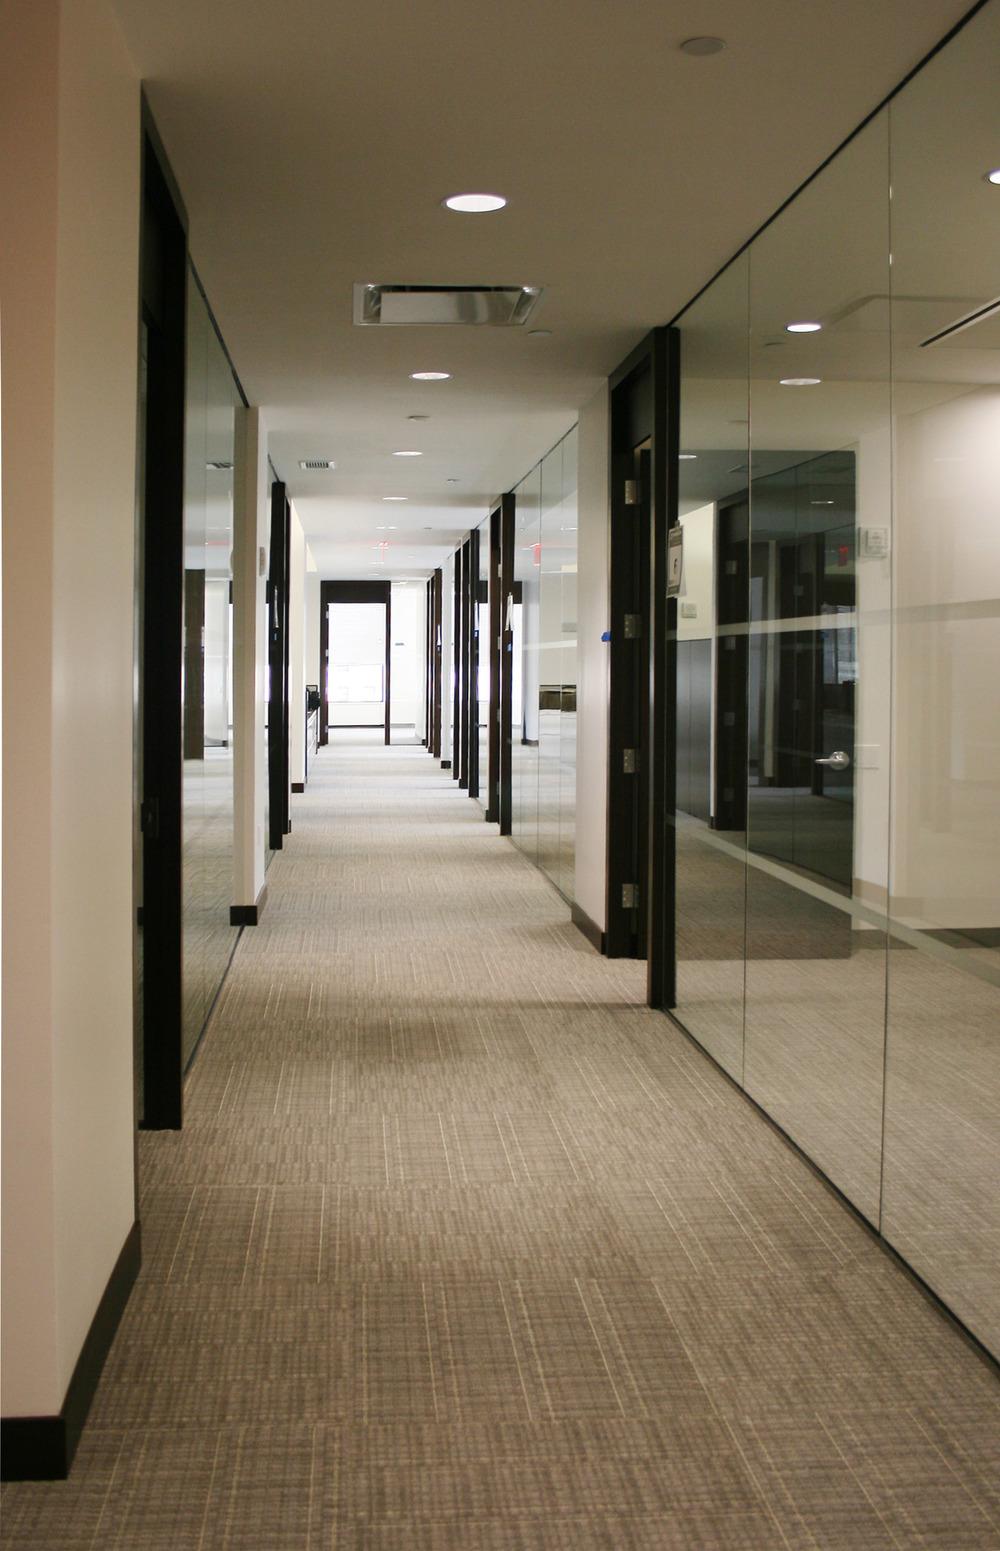 TCC - Corridor 02.JPG